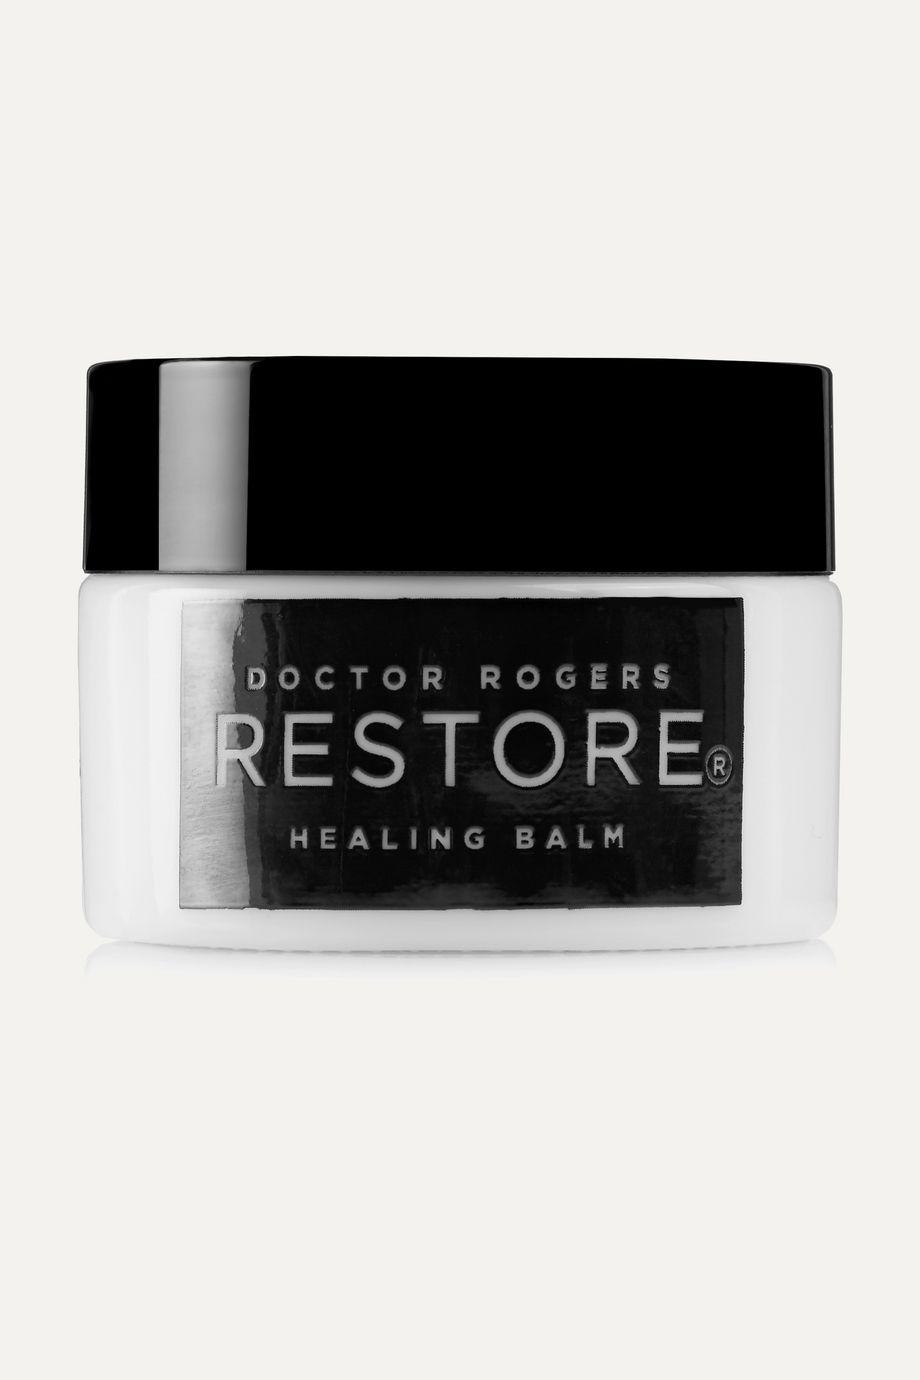 Doctor Rogers Restore Healing Balm, 28g